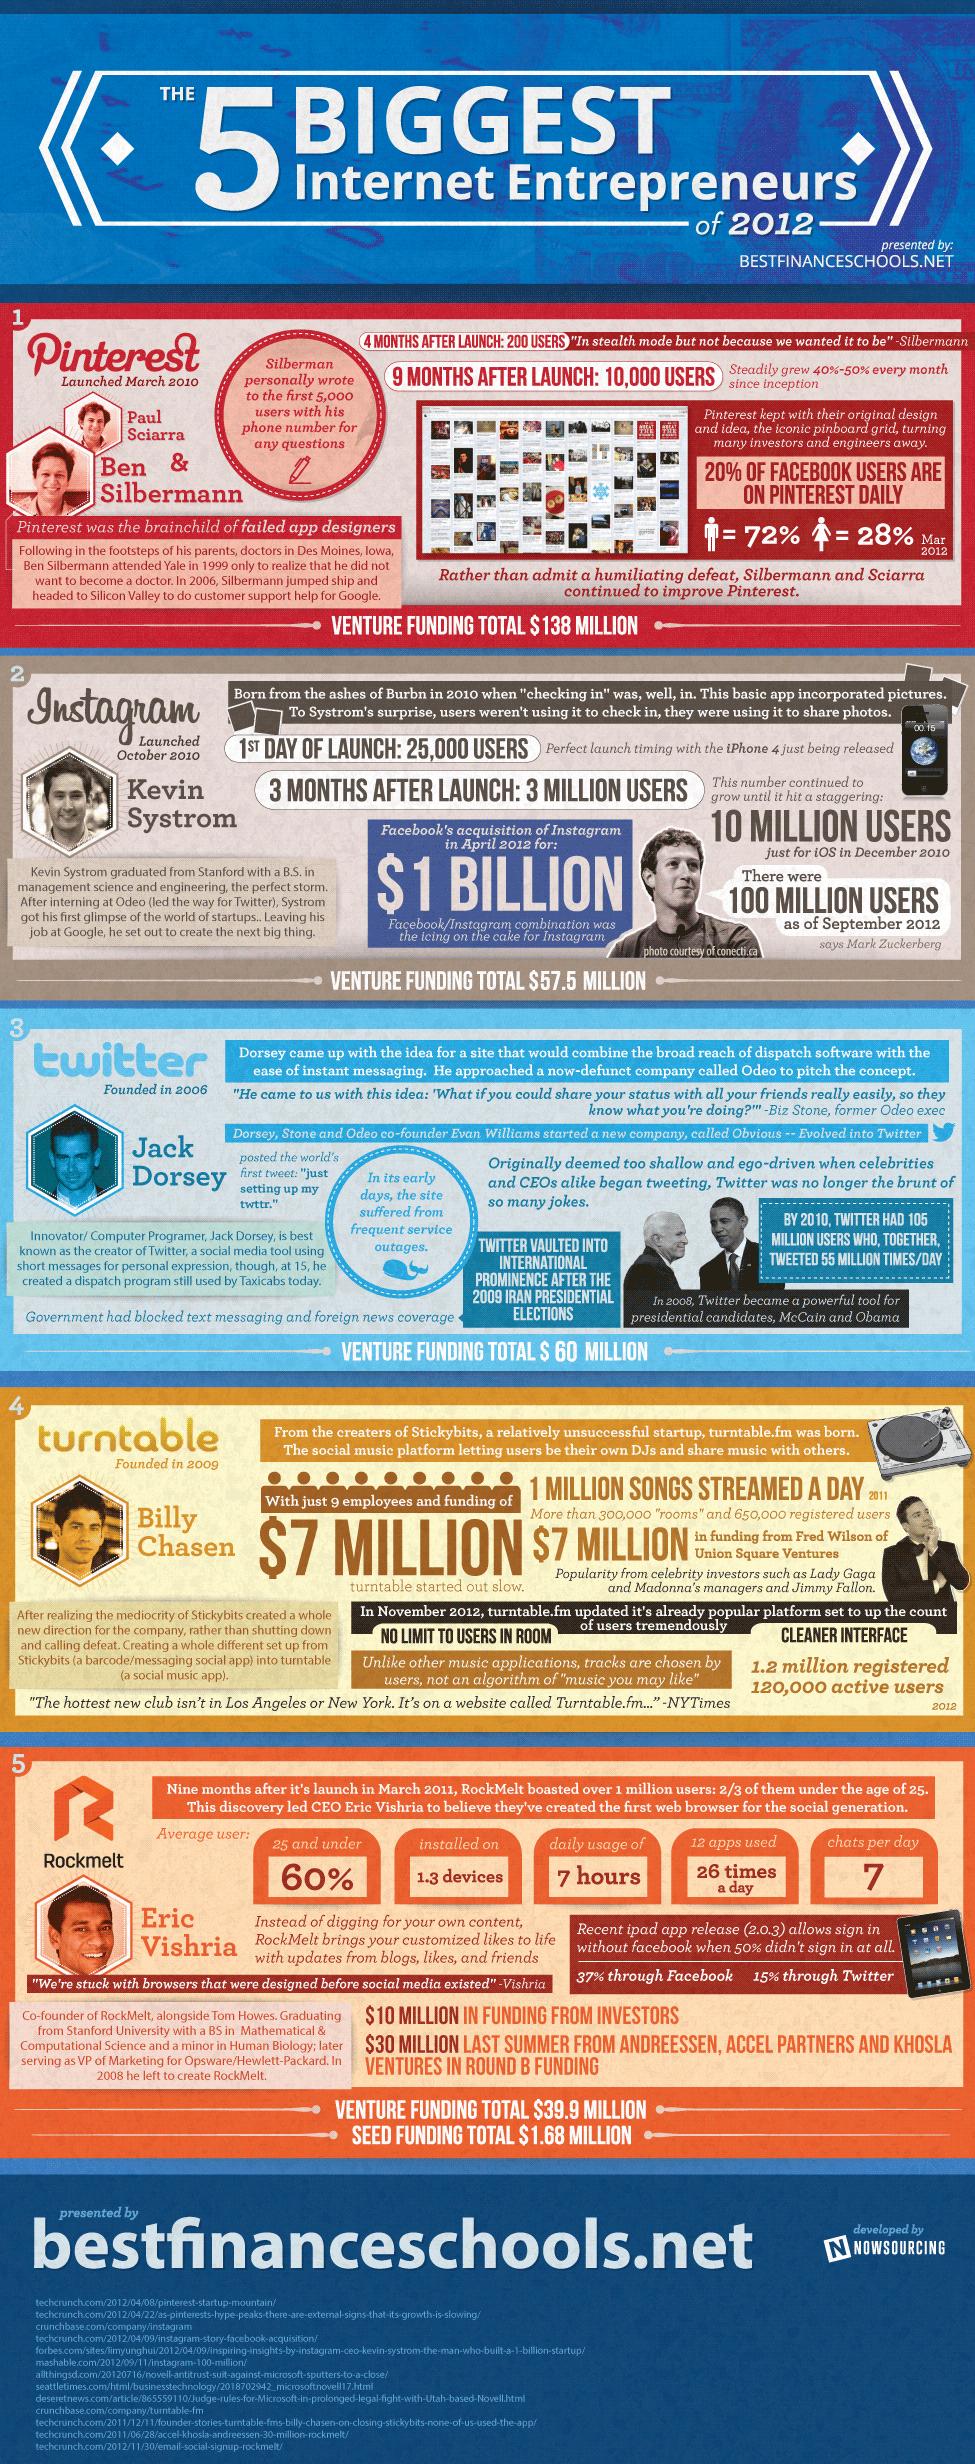 the-5-biggest-internet-entrepreneurs-of-2012_50ec55ec00c4e